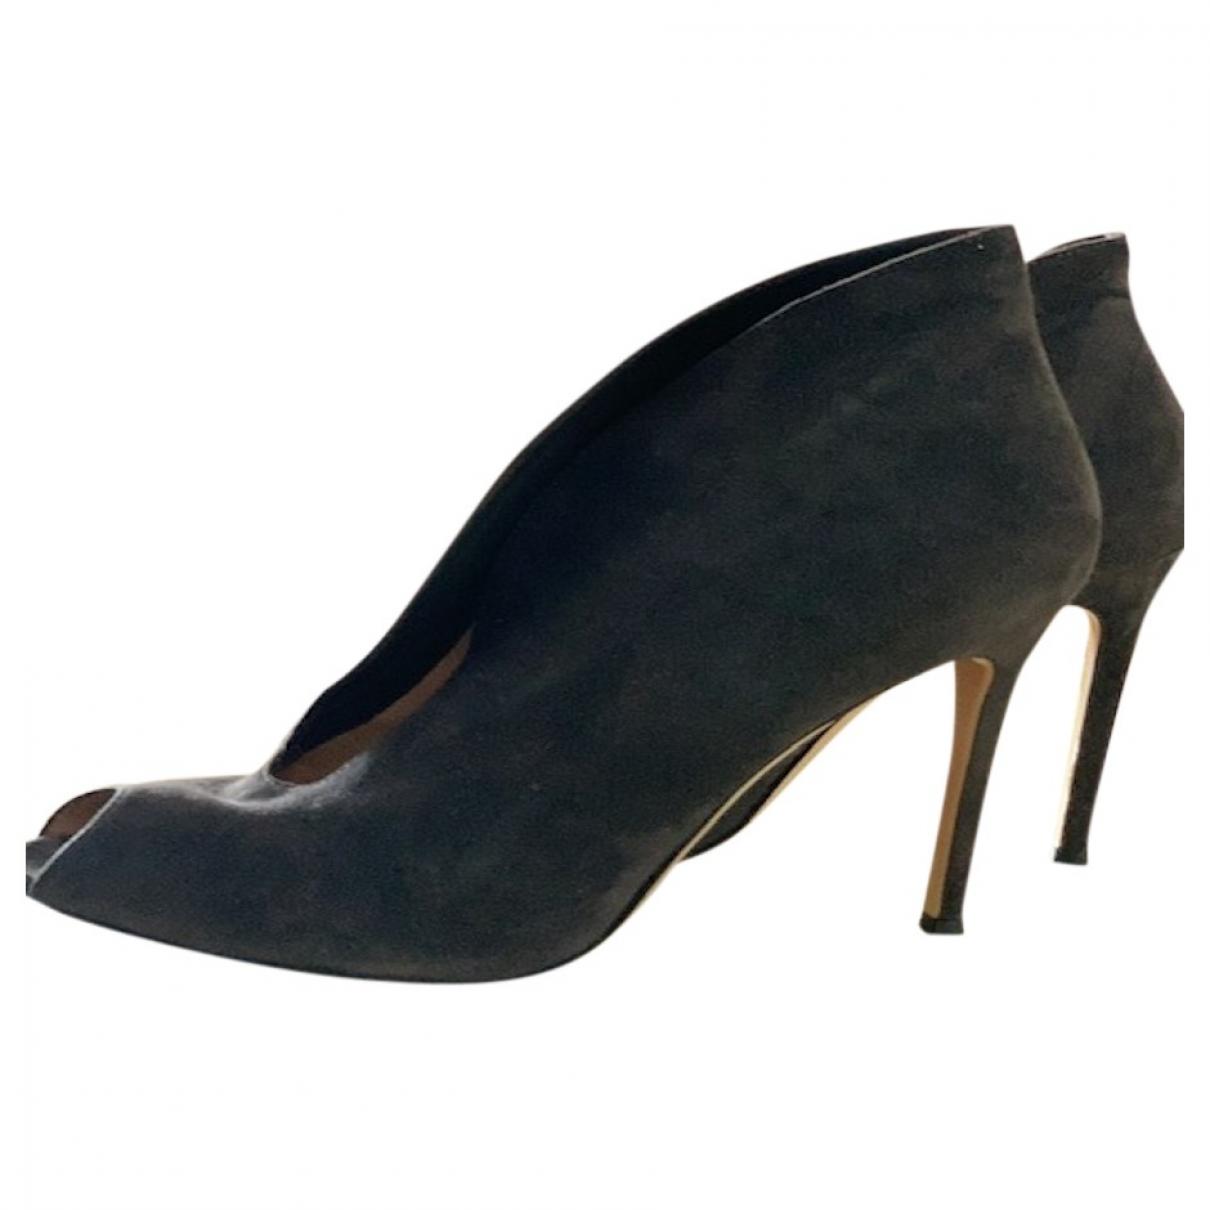 Gianvito Rossi \N Grey Suede Heels for Women 38 EU